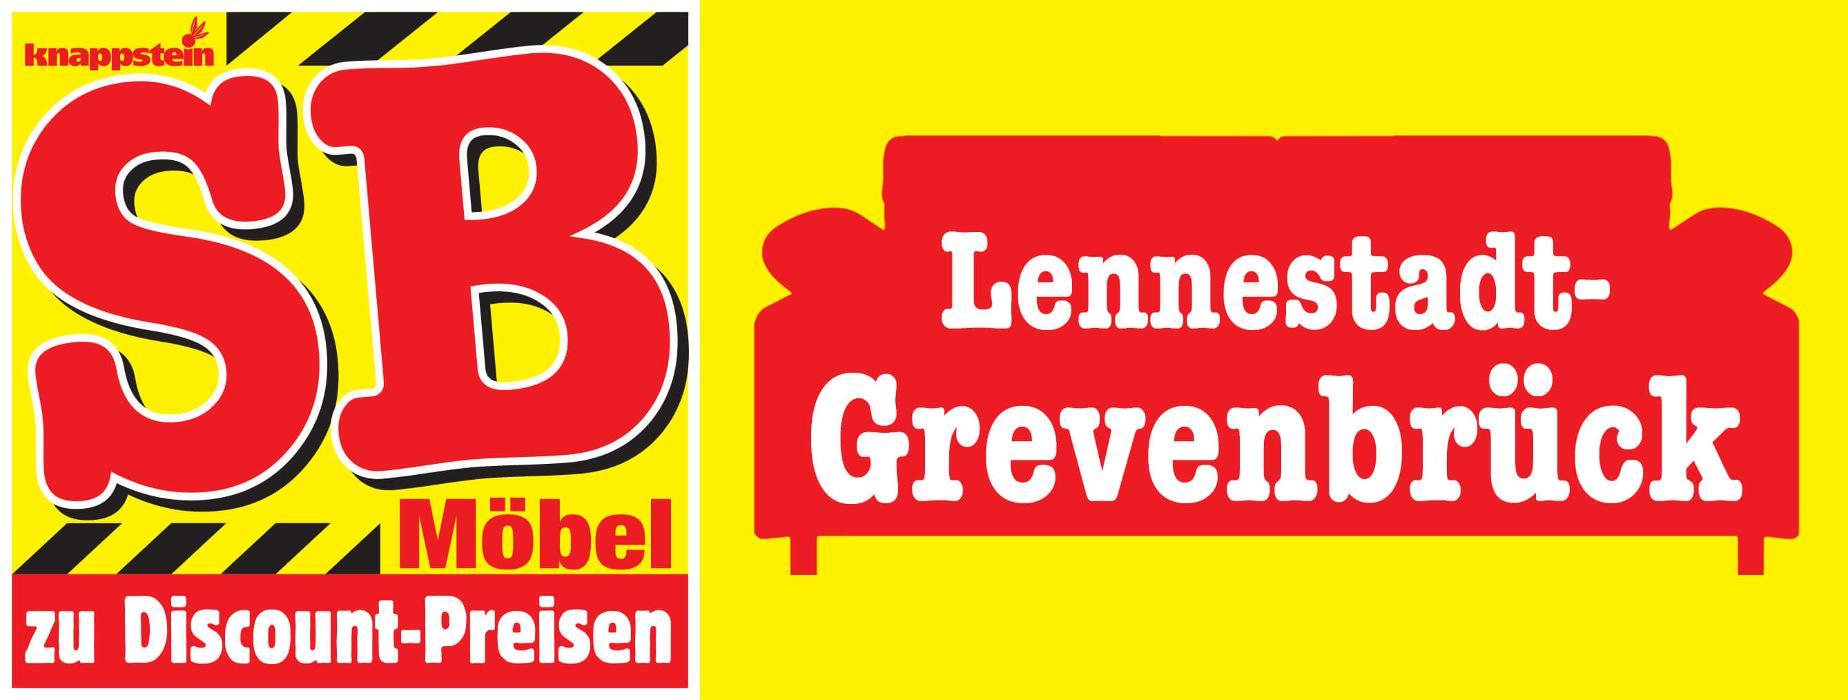 Sb Möbel Knappstein Lennestadt Dr Paul Müller Straße 11